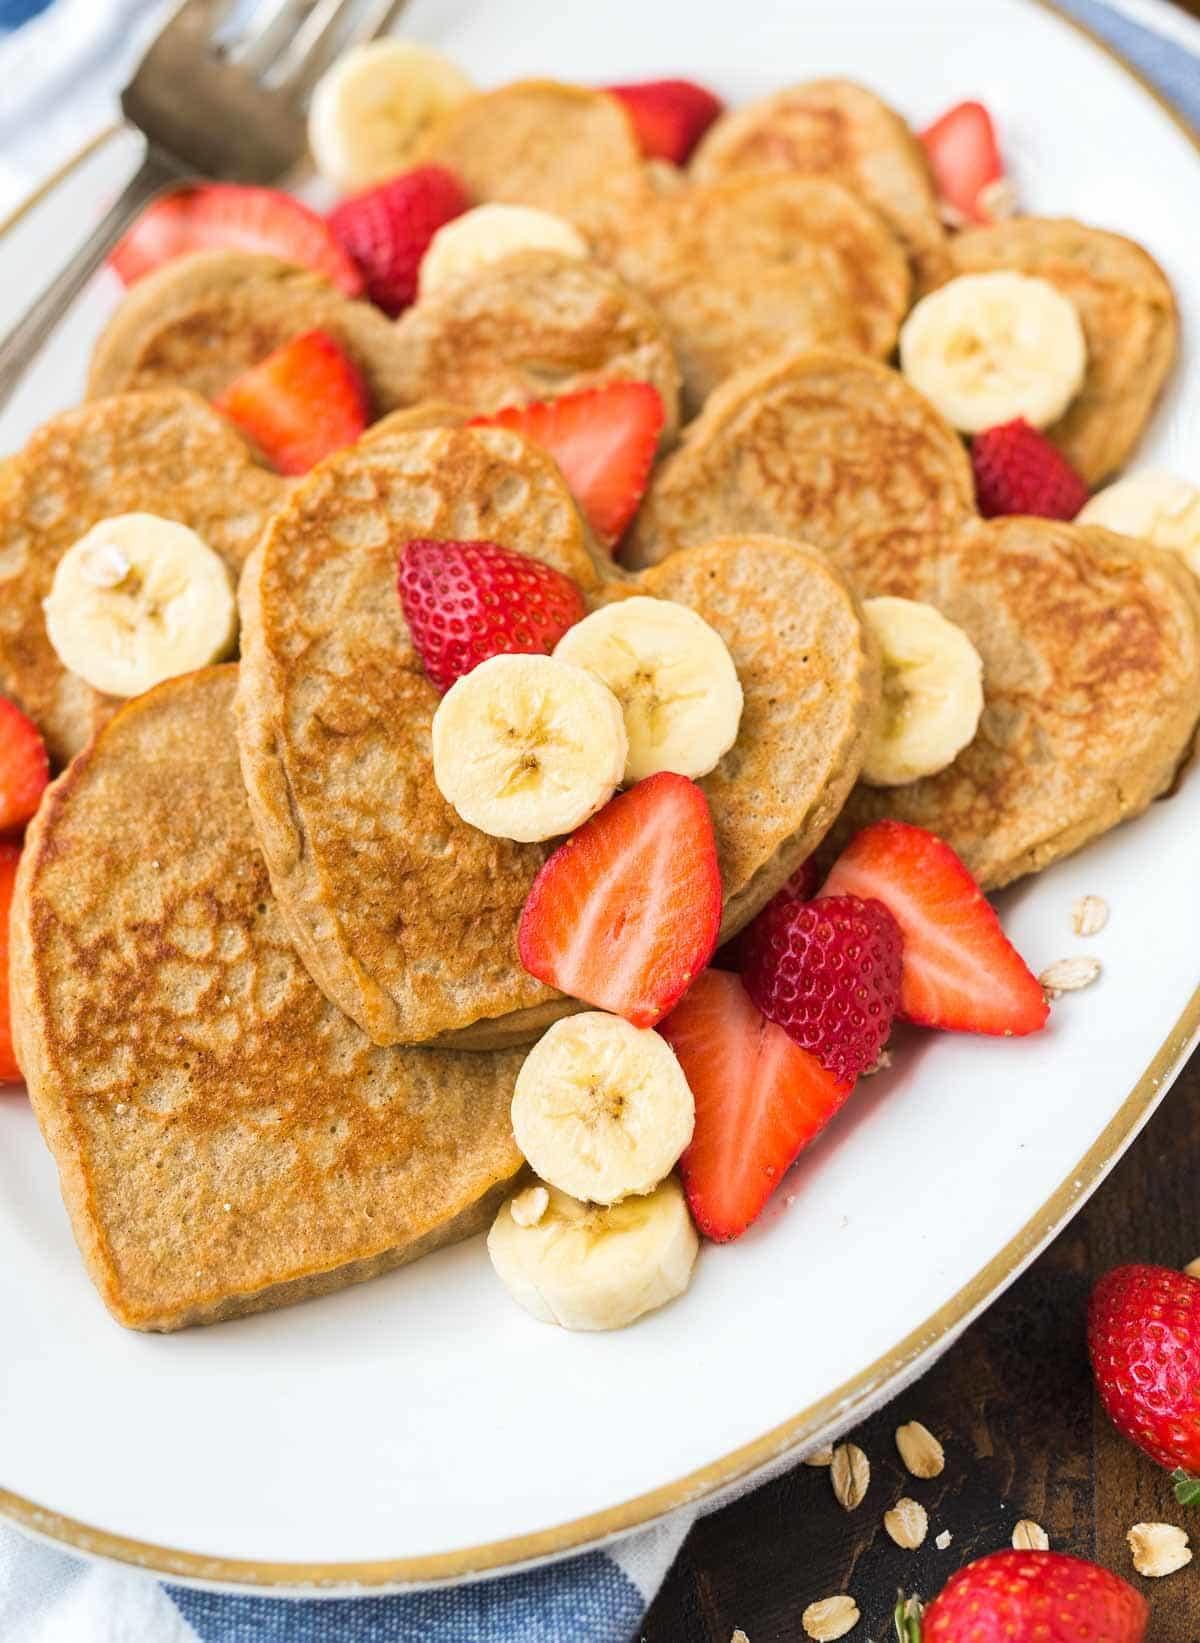 Banana-Pancakes-Healthy-Recipe.jpg